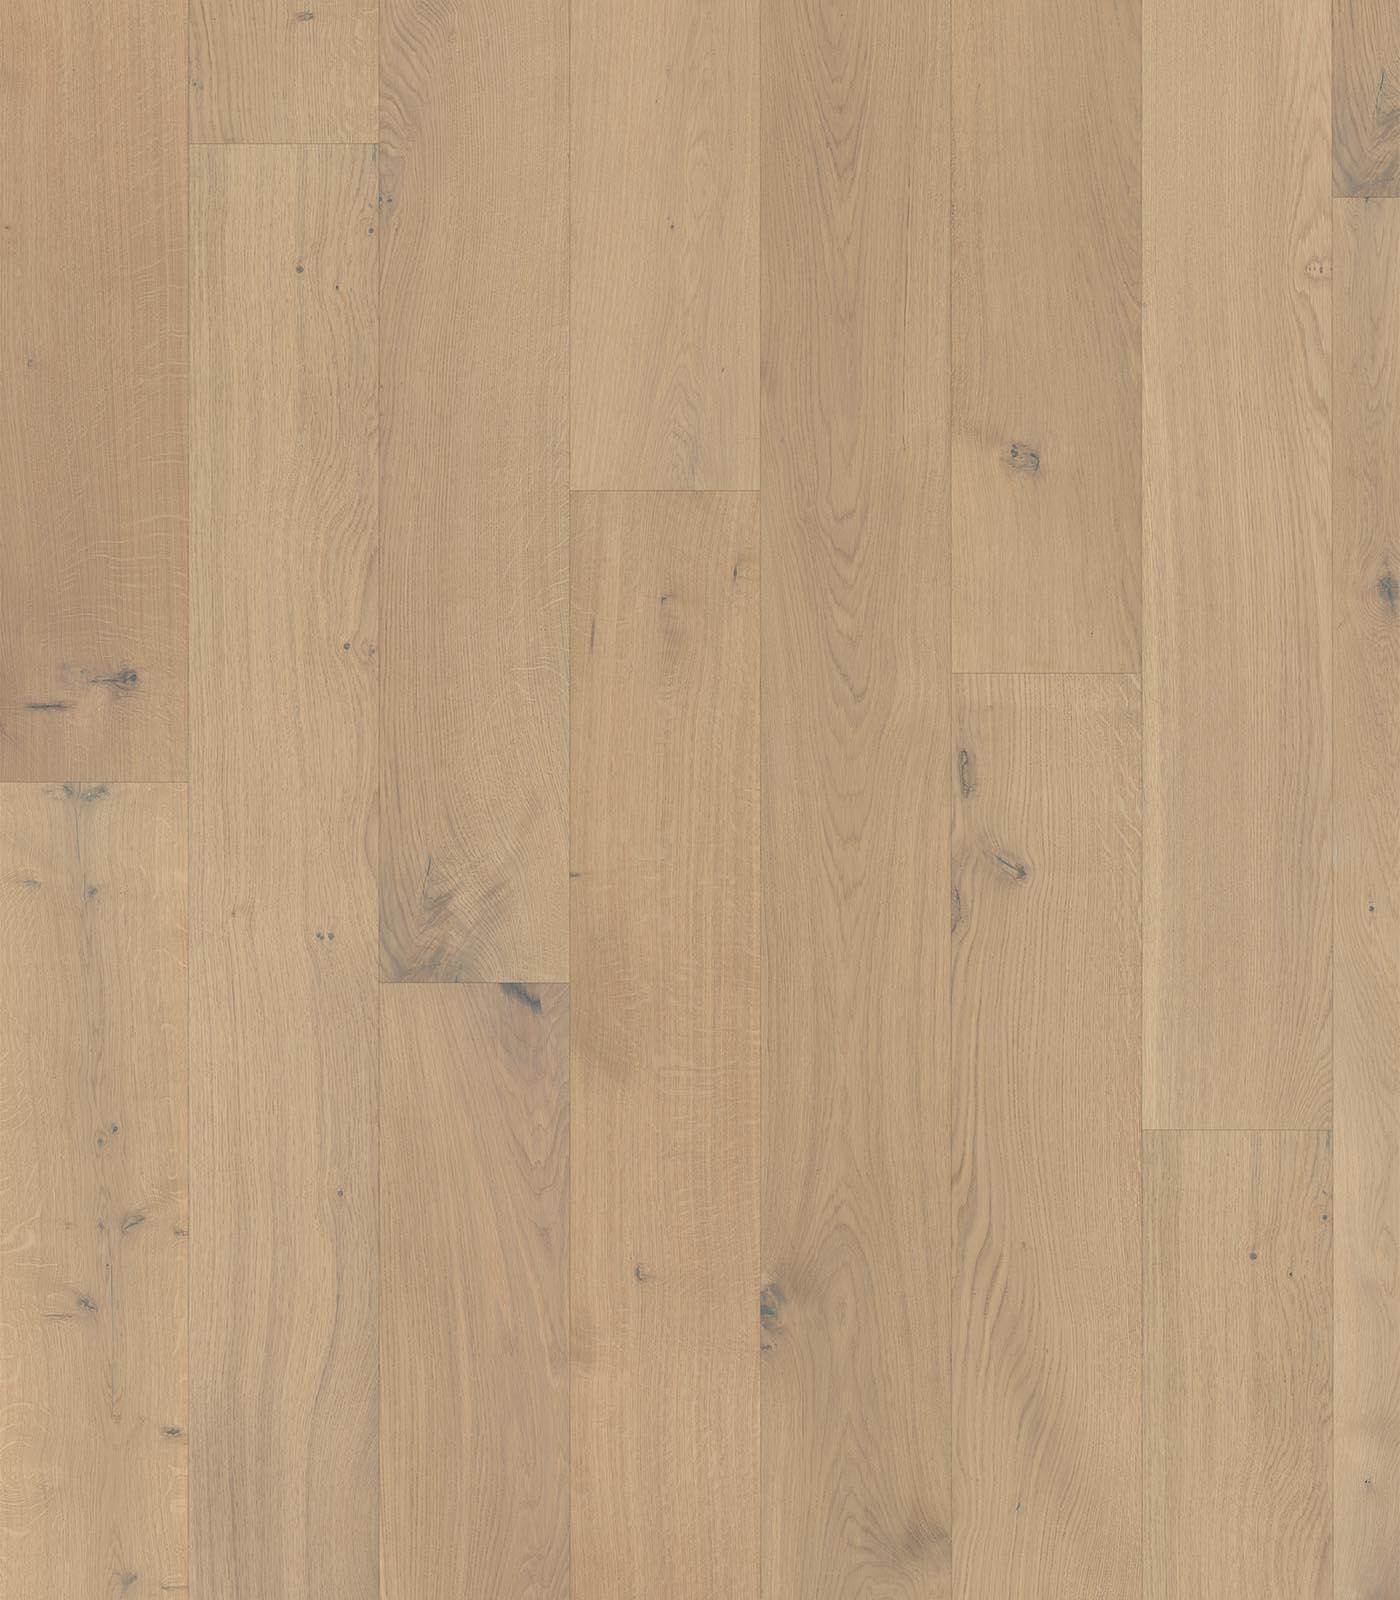 Karsdorf-Variante Collection-European Oak Floors-flat